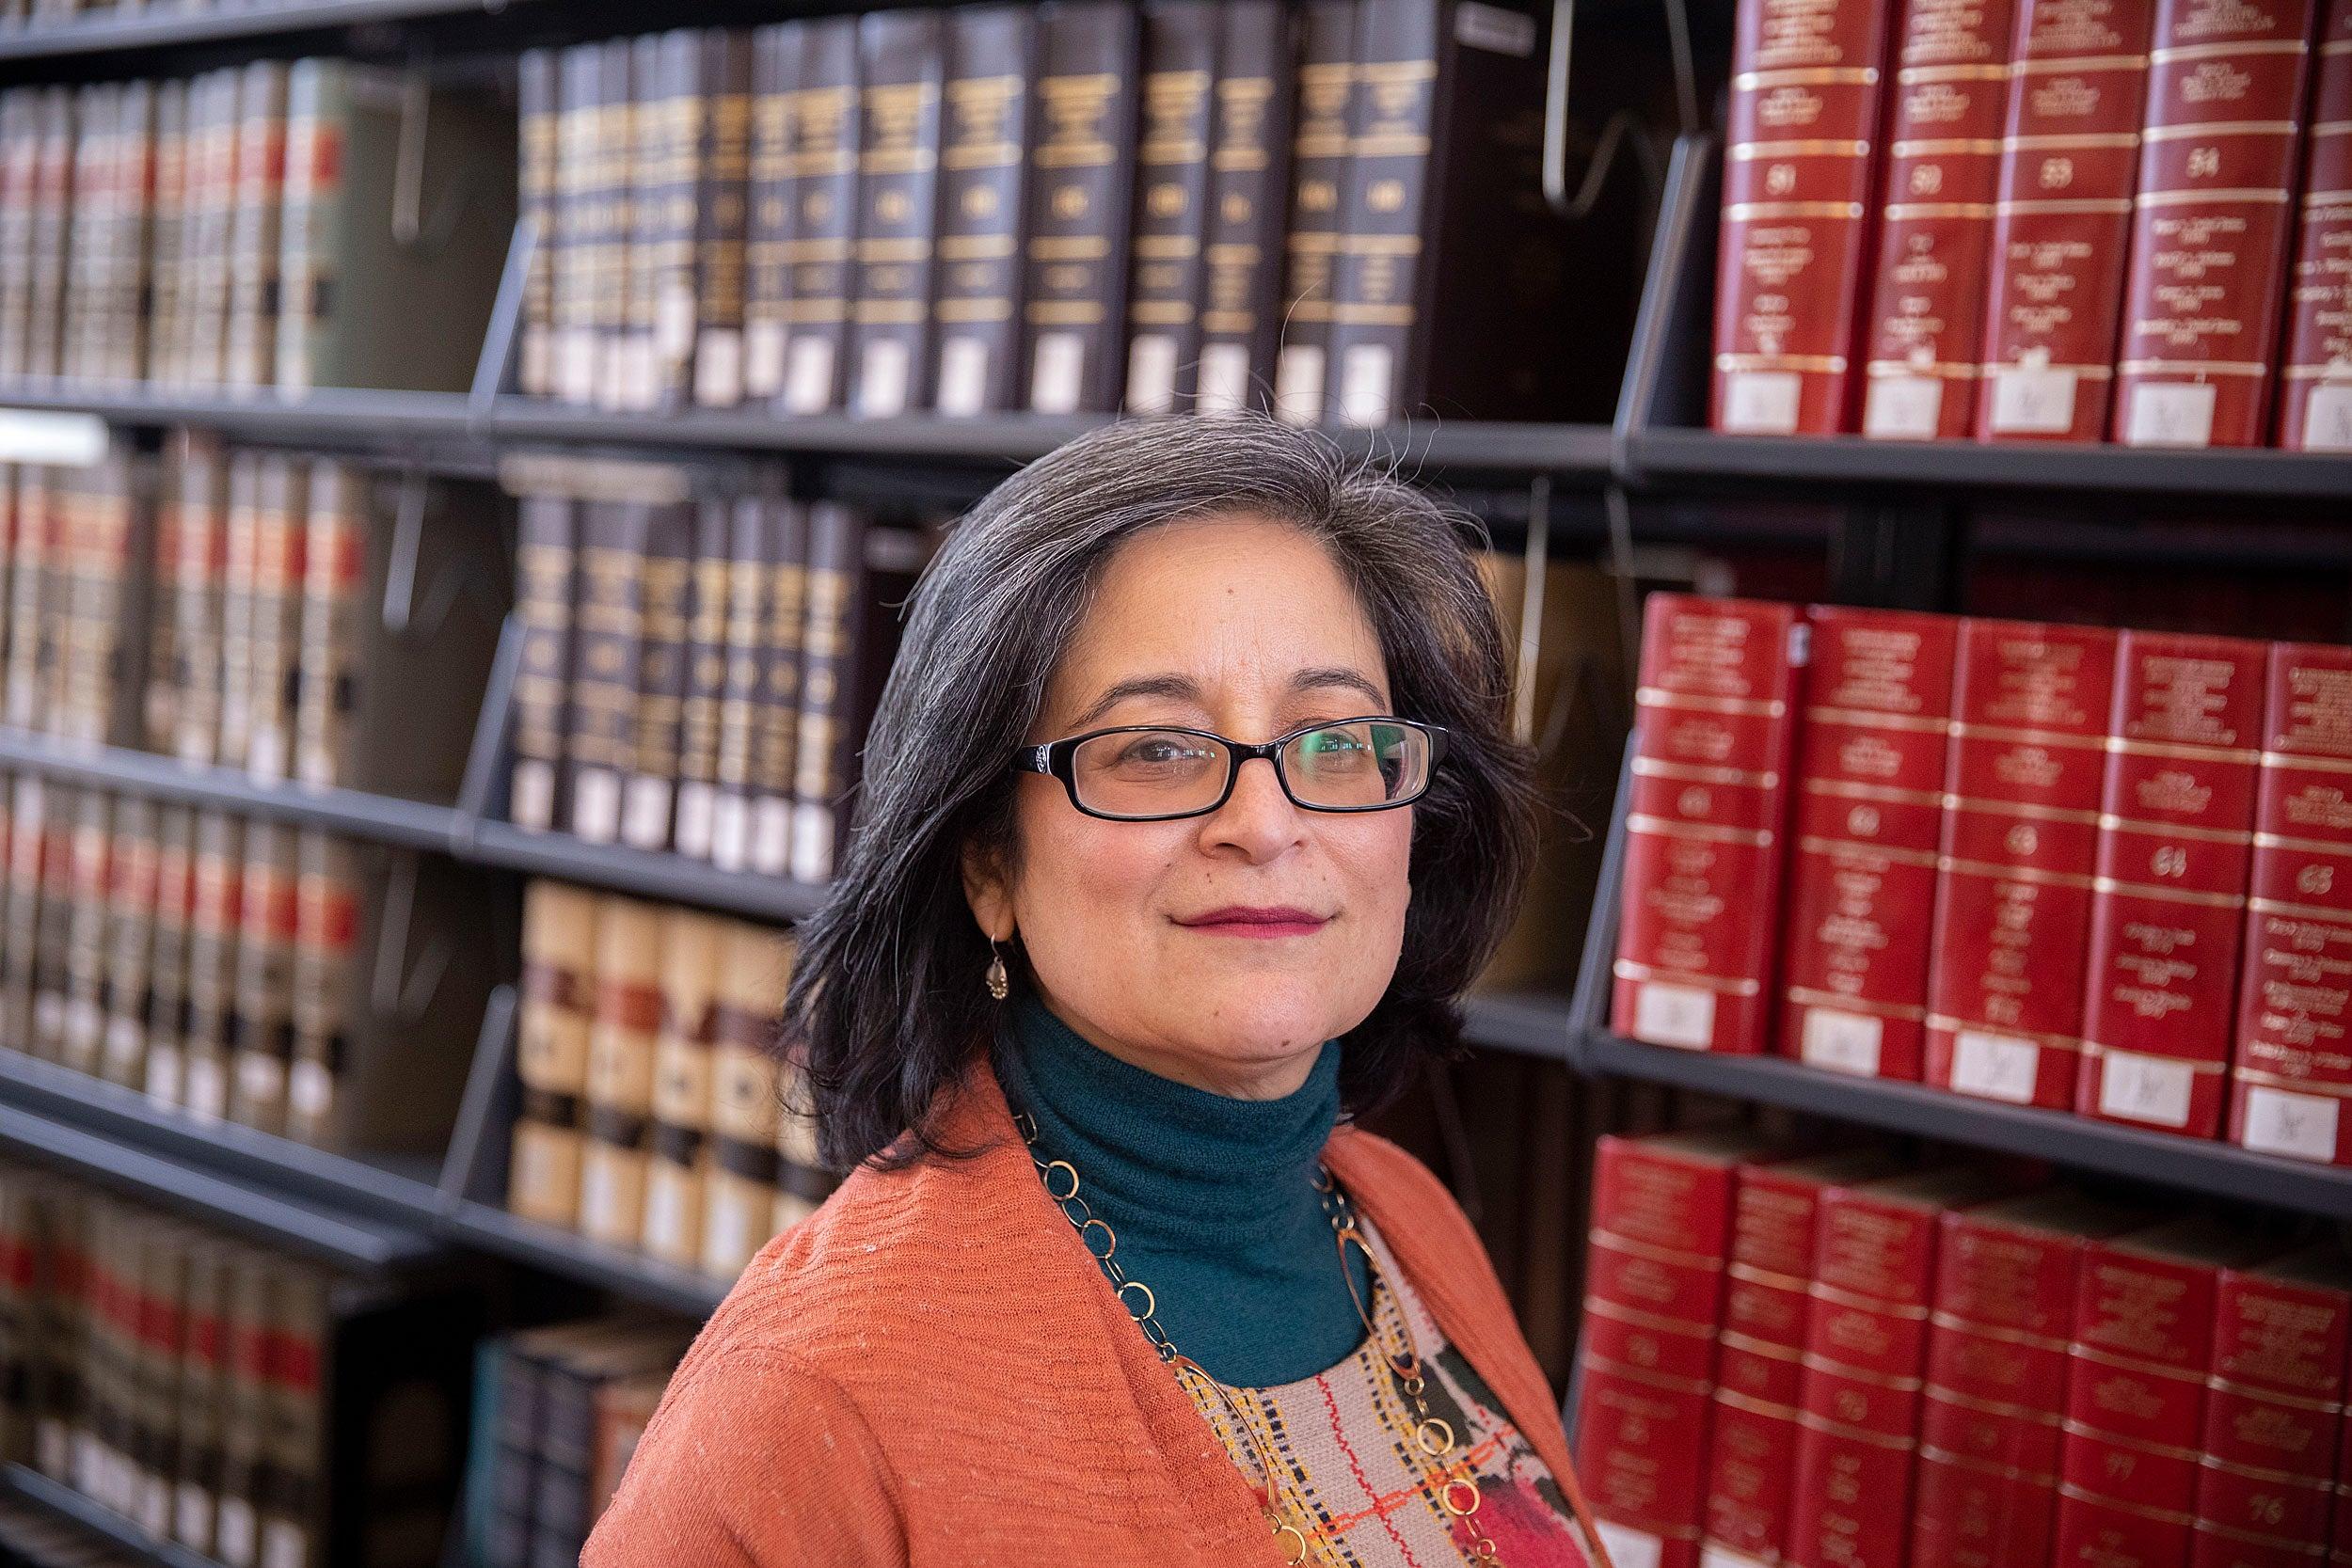 Harvard Deputy General Counsel Diane E. Lopez will succeed Iuliano in June